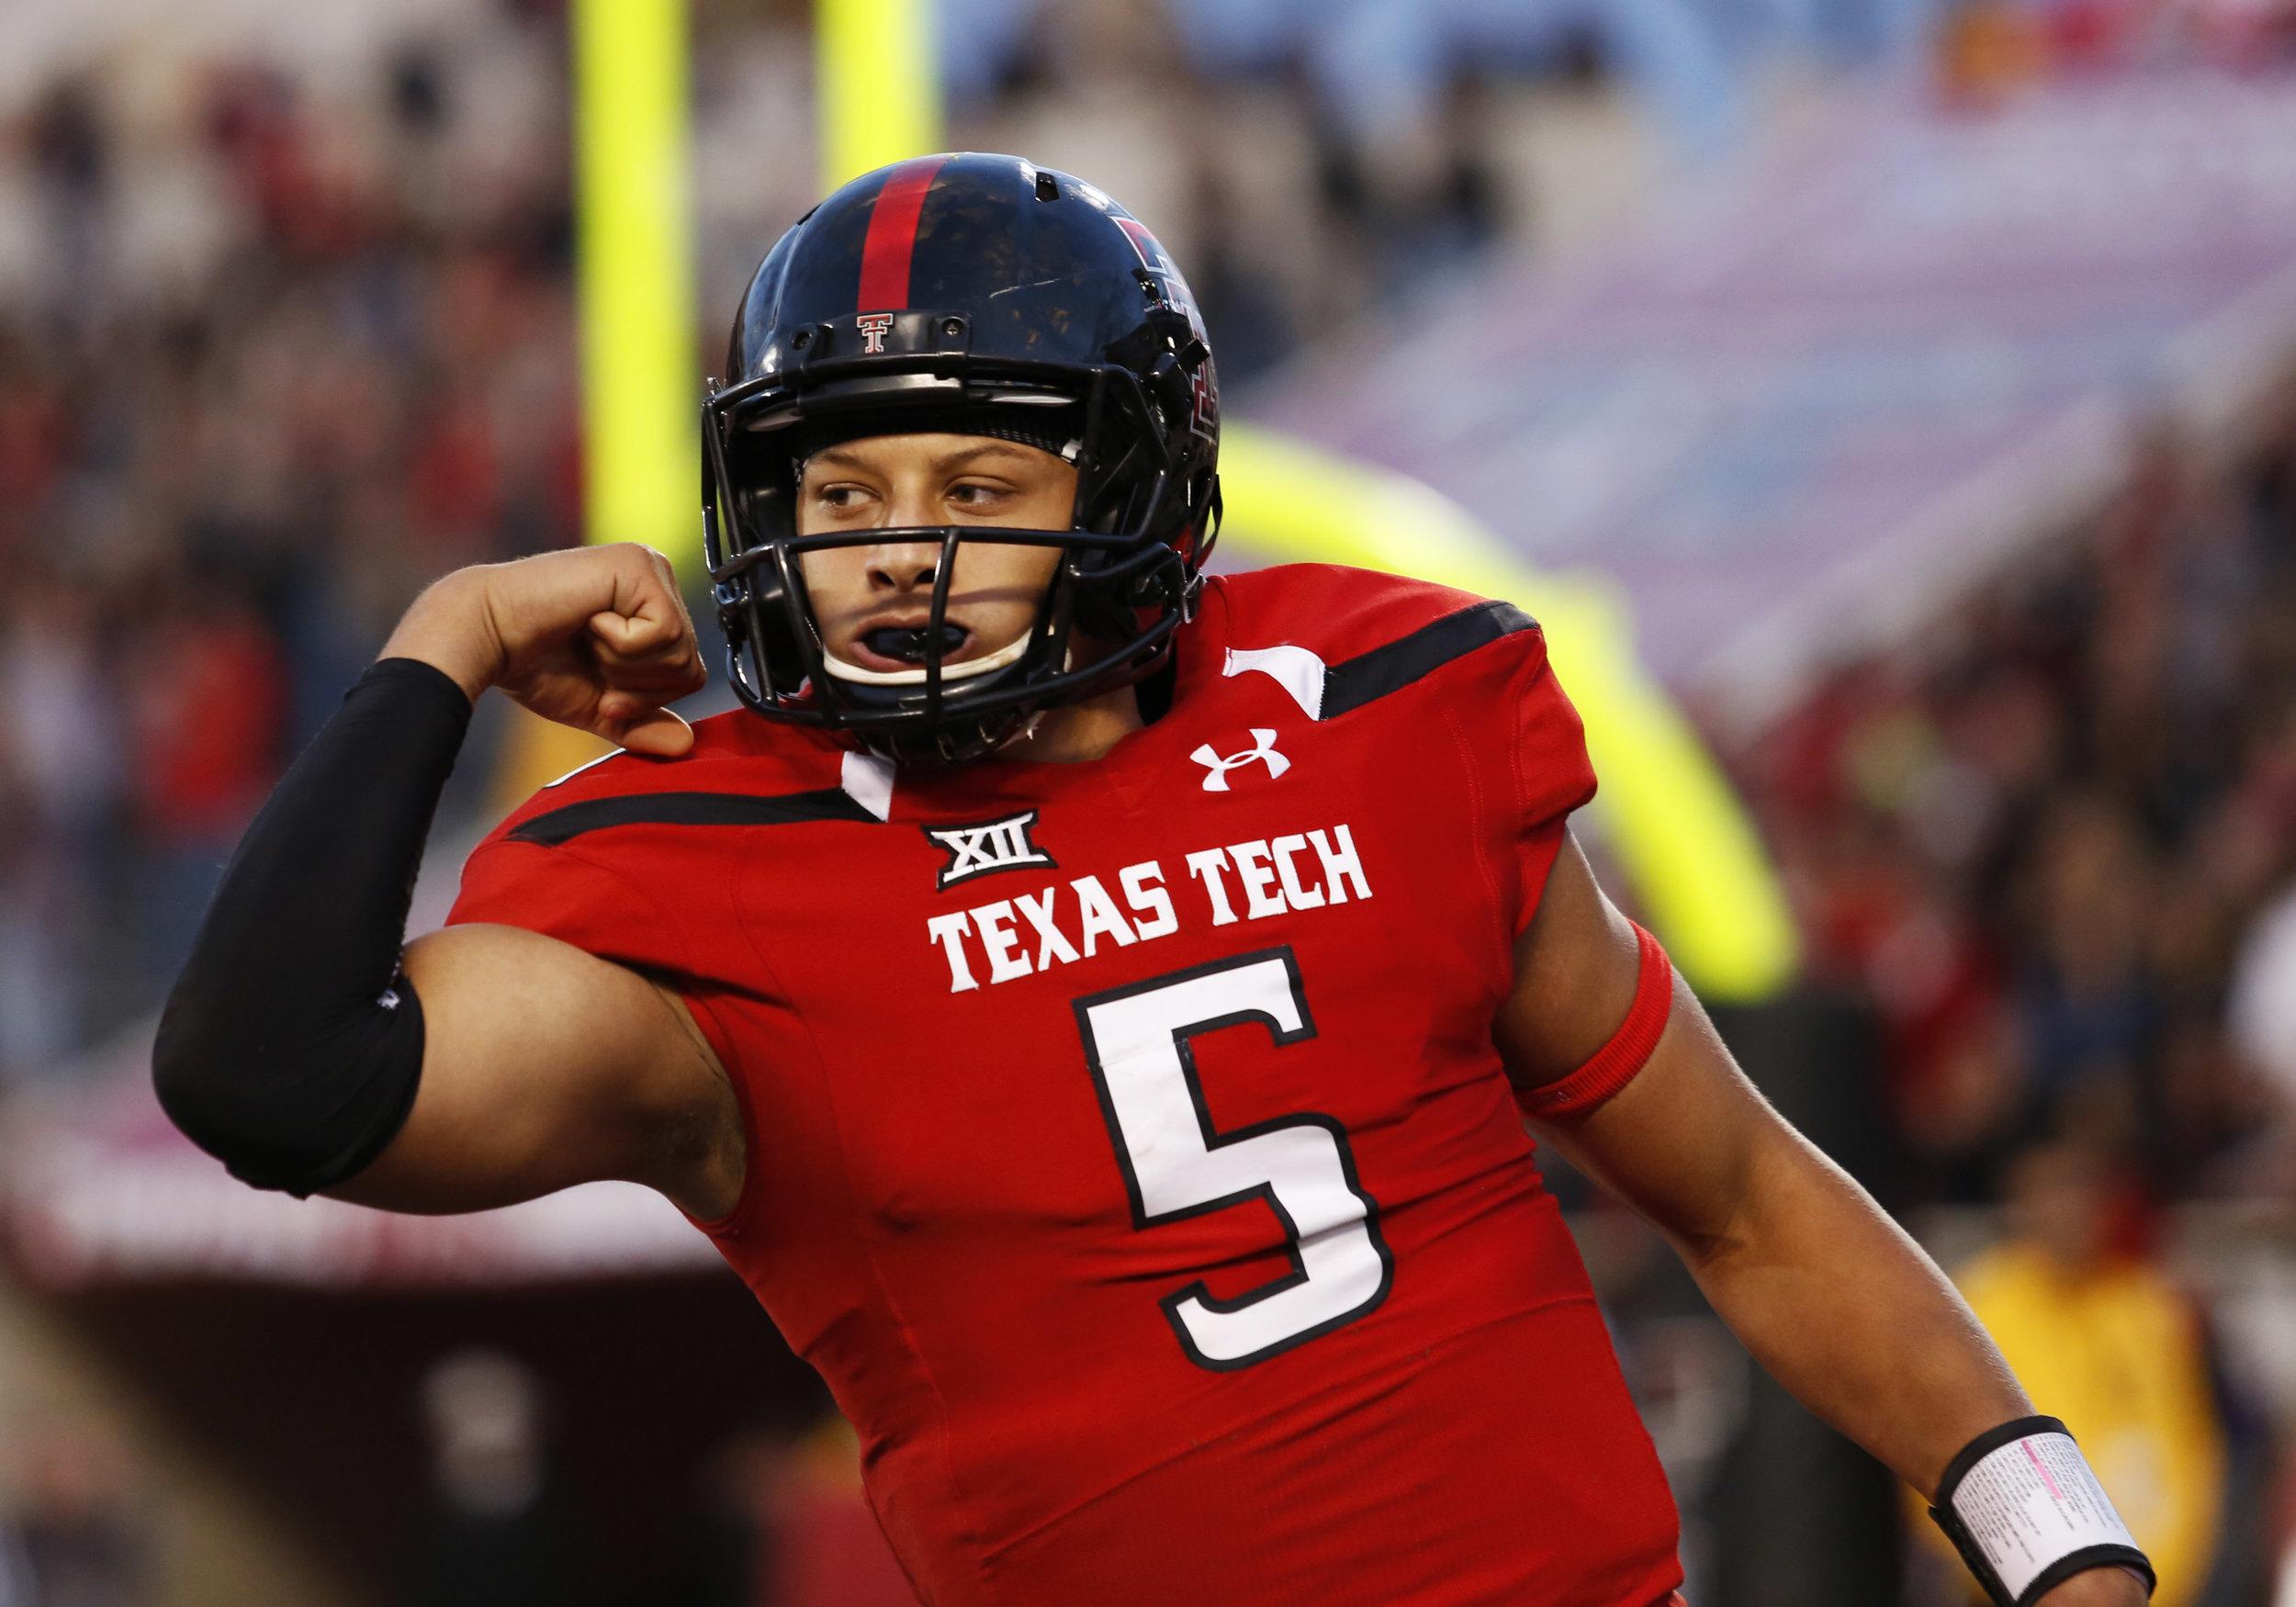 DFN15111425_Texas_Tech_Red_Raiders_vs_Kansas_State_Wildcats.JPG